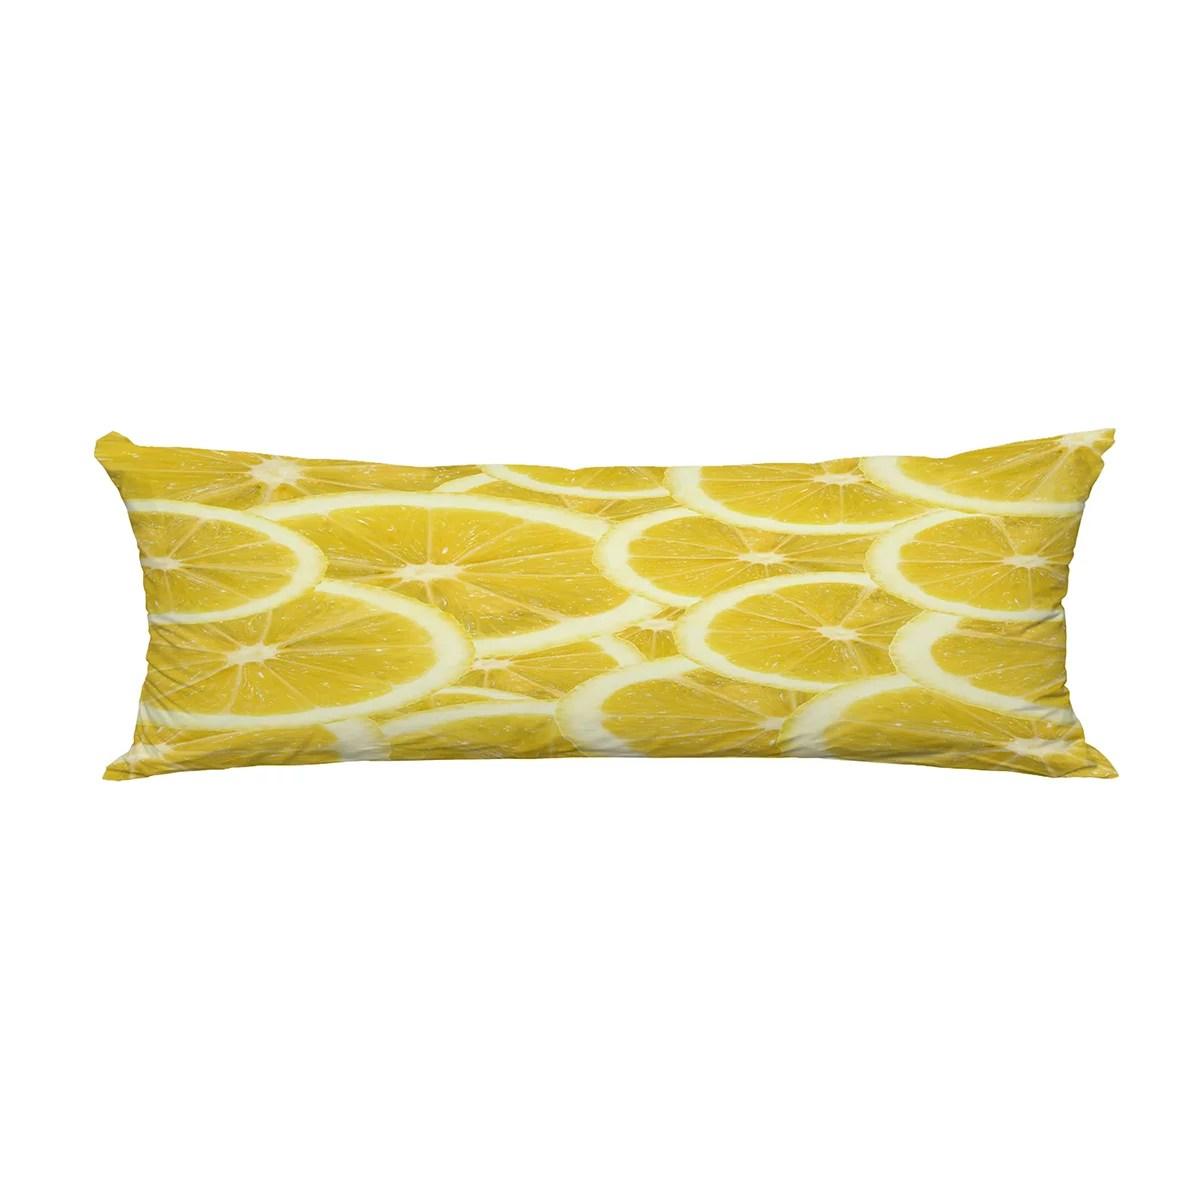 abphqto fresh yellow lemon body pillow covers pillow case protector pillowcase 20x60 inch